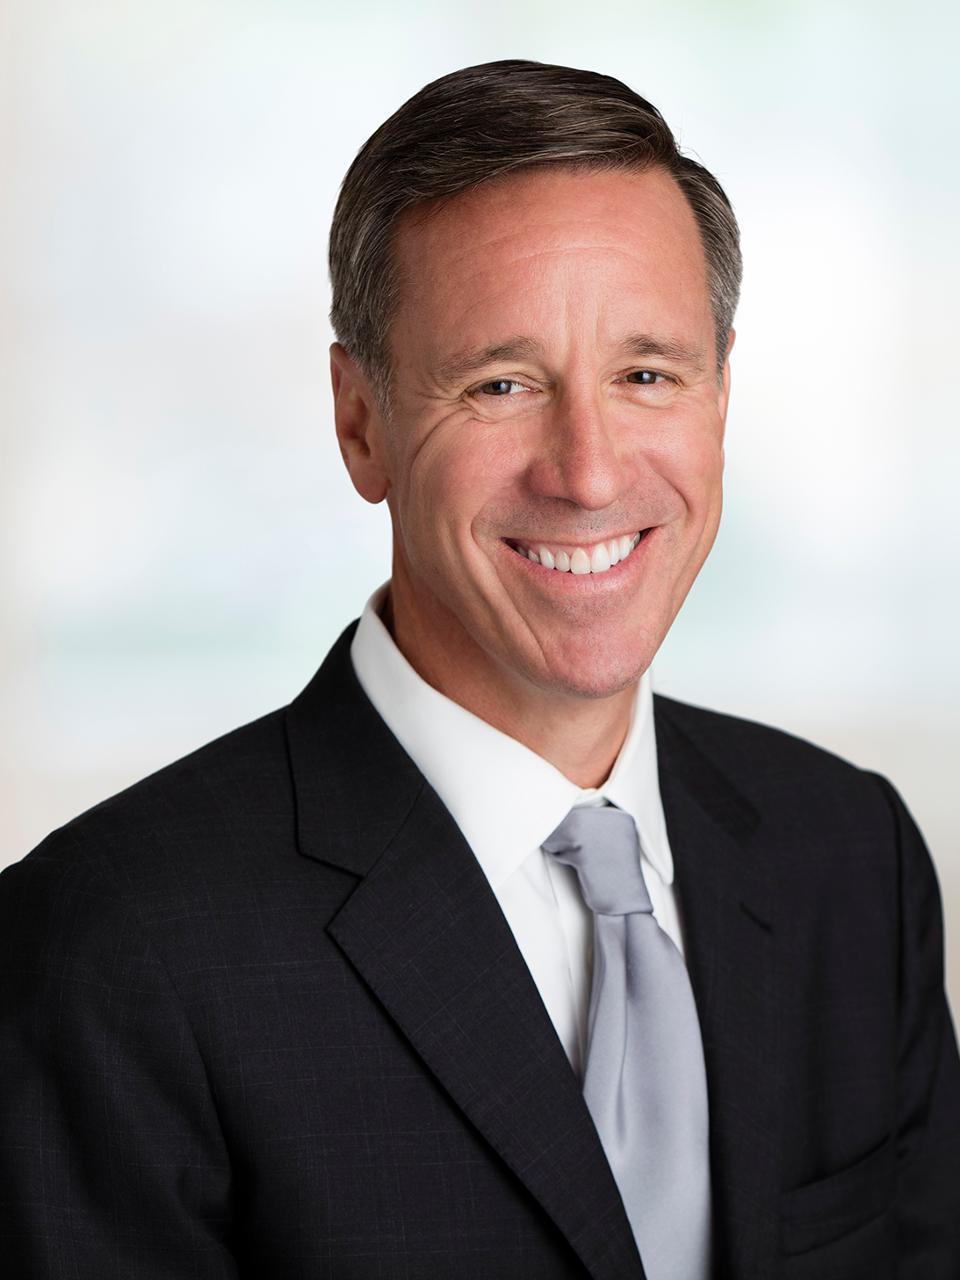 Official headshot: Arne Sorenson, President and CEO of Marriott International